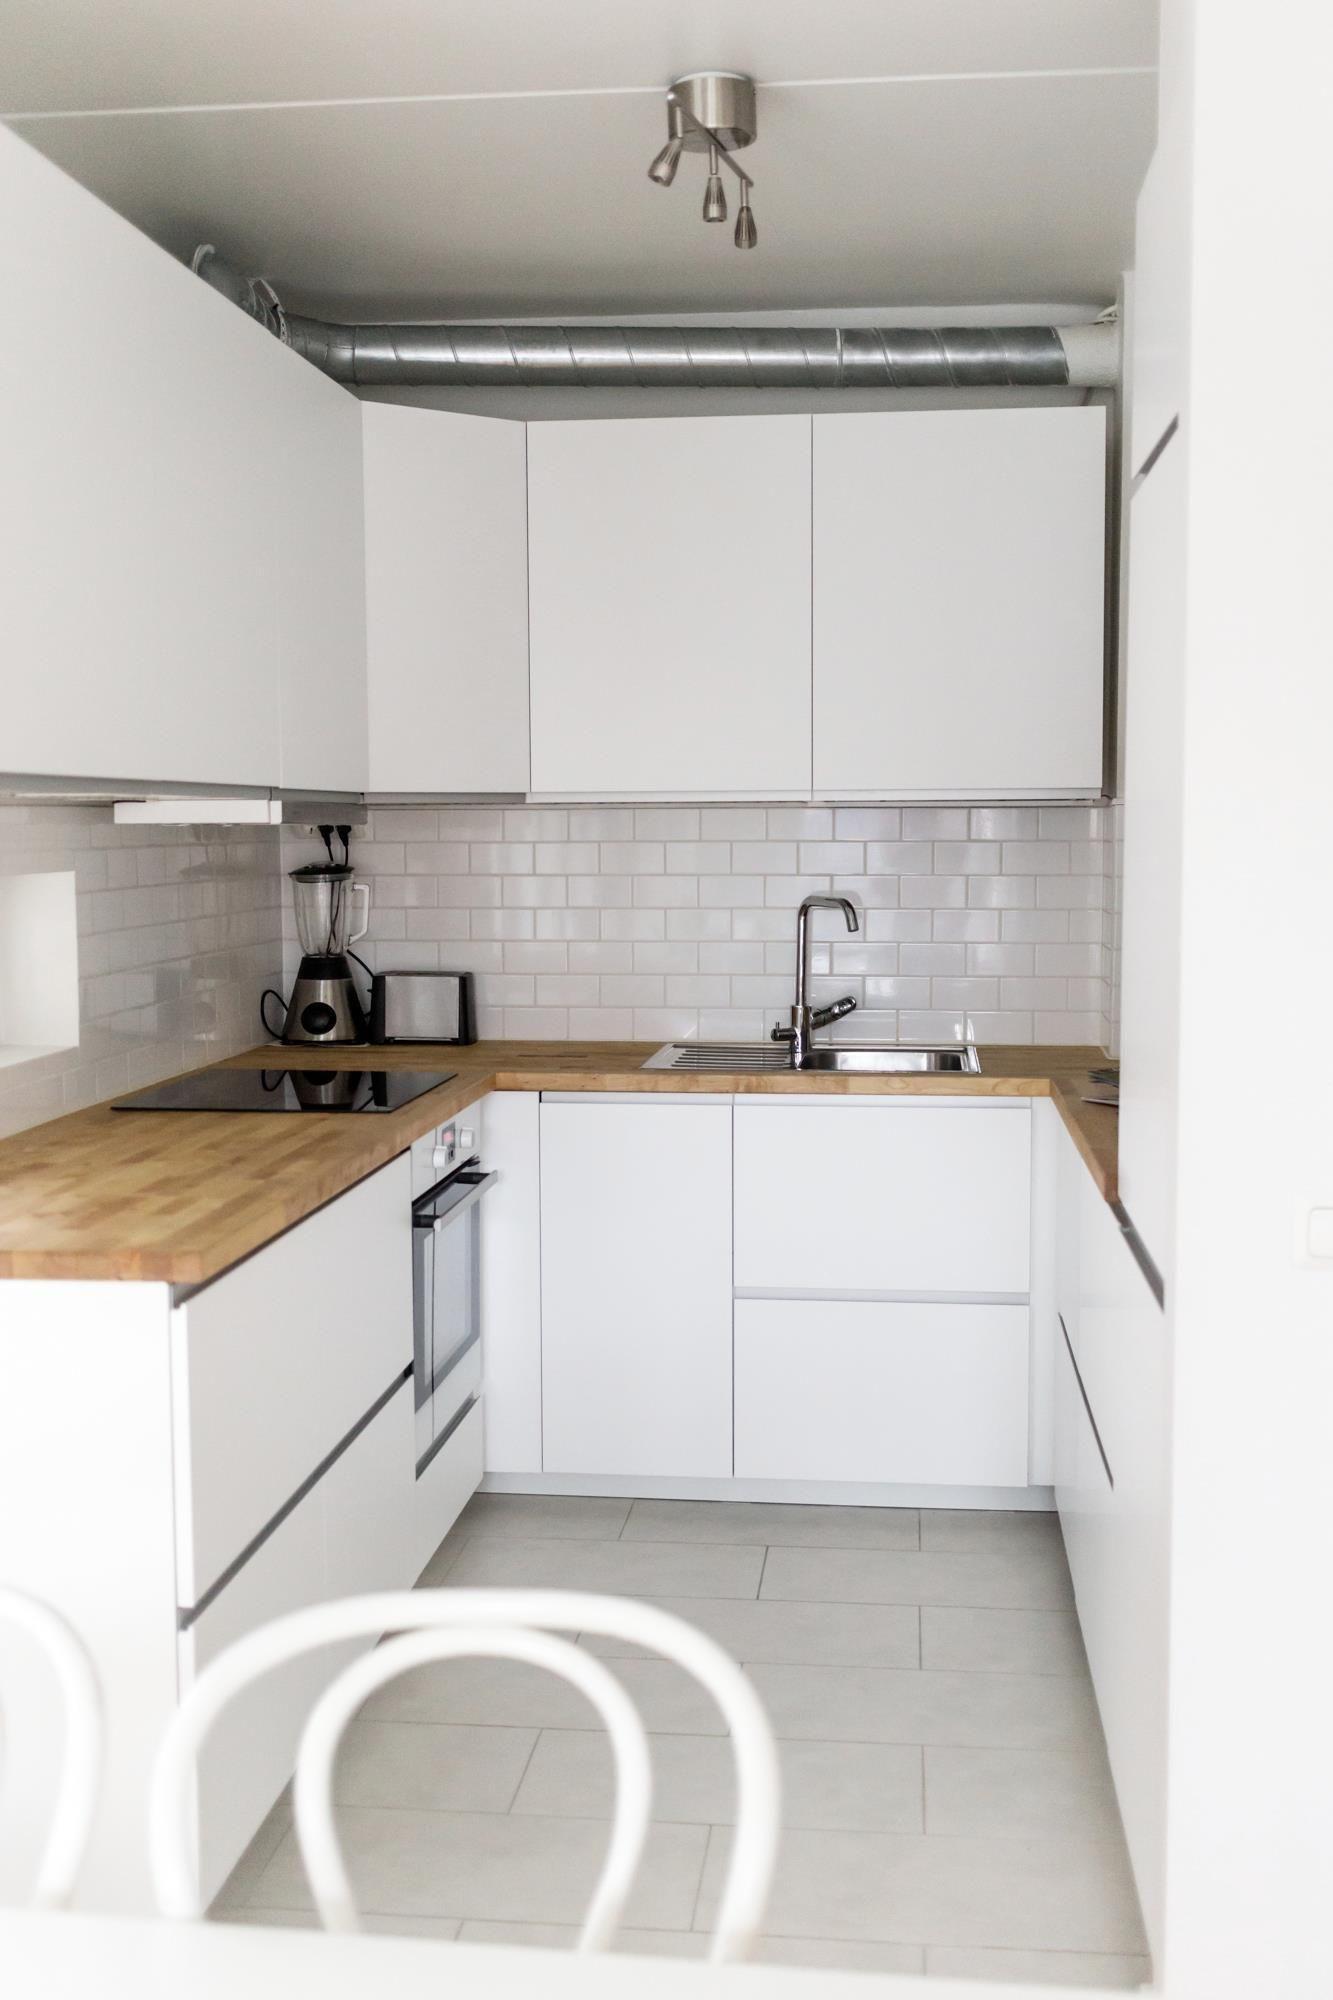 Ikea Keitti 246 Home Kitchen Cabinets Kitchen Home Decor